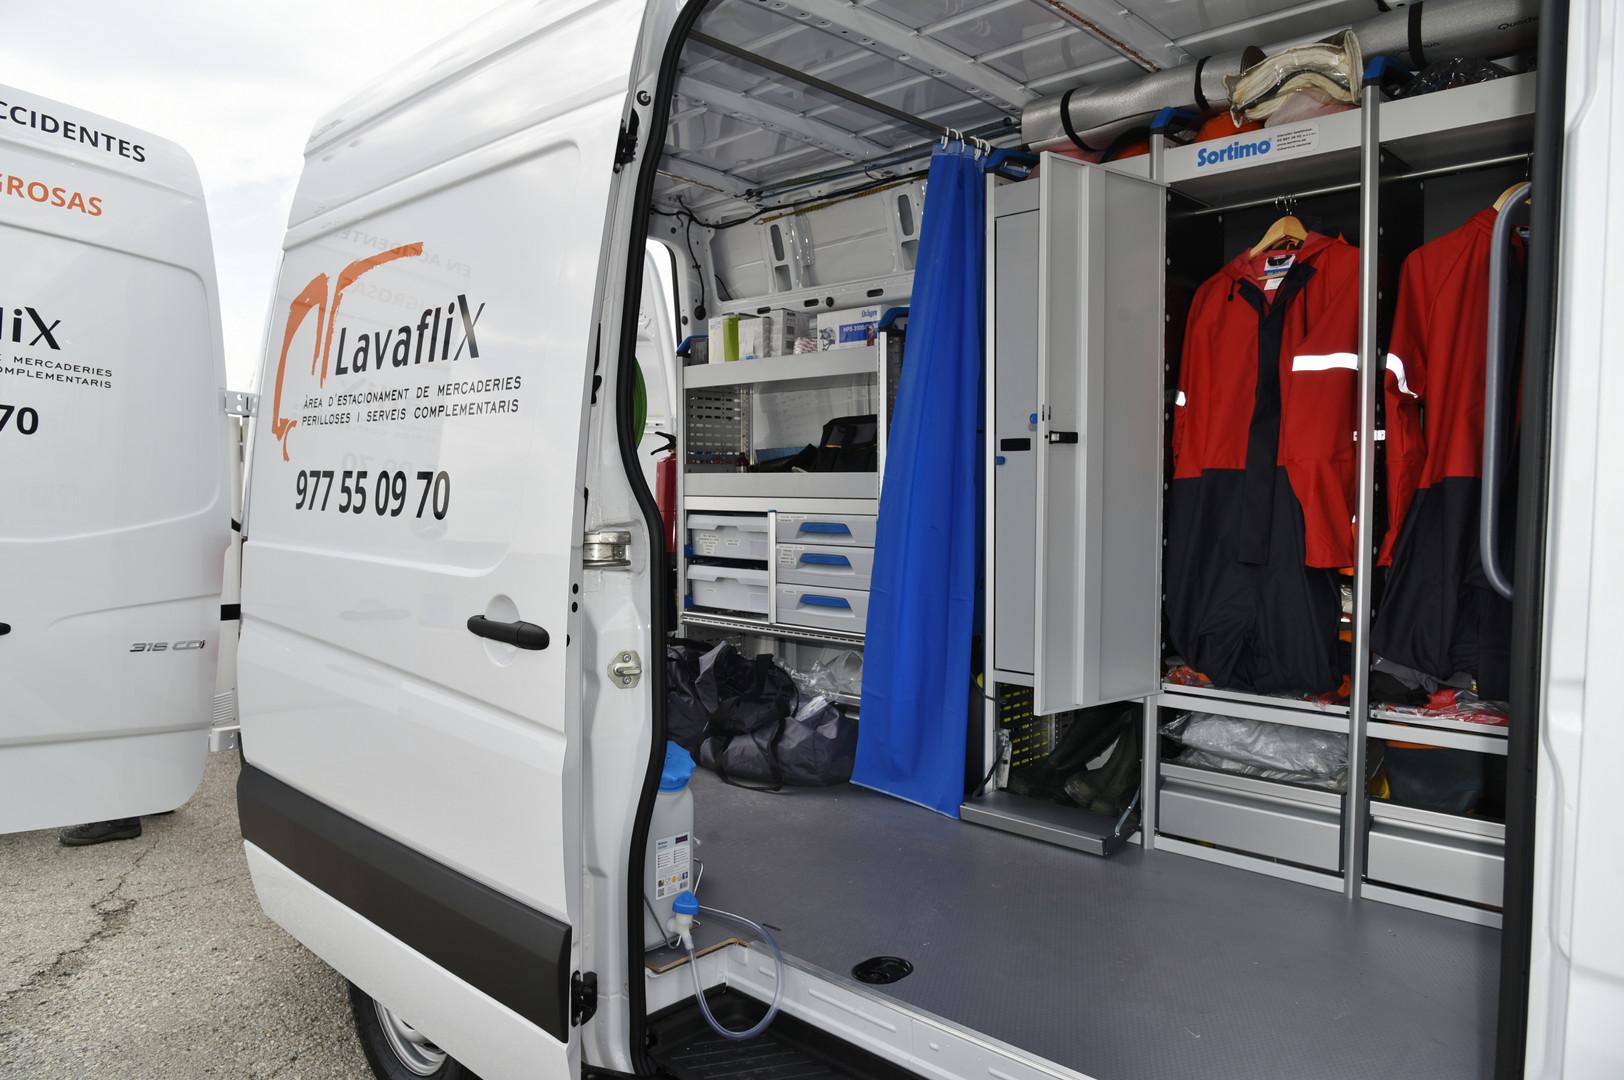 lavaflix rescate mercancias.jpg